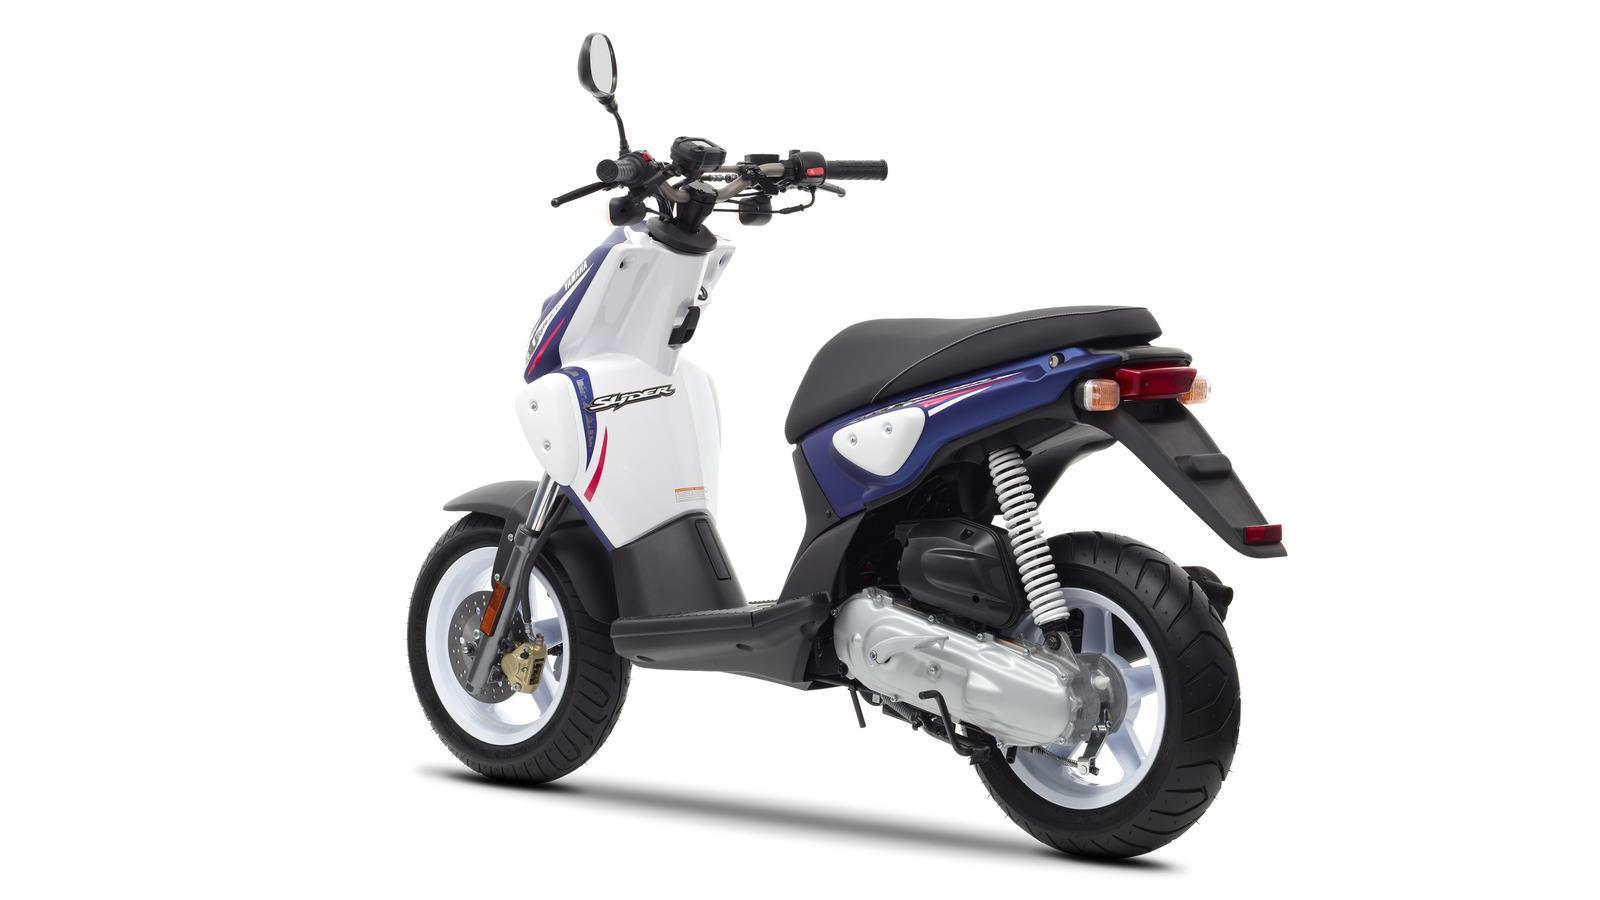 Мотоцикл Yamaha SLIDER 50 NAKED 2013 Фото, Характеристики